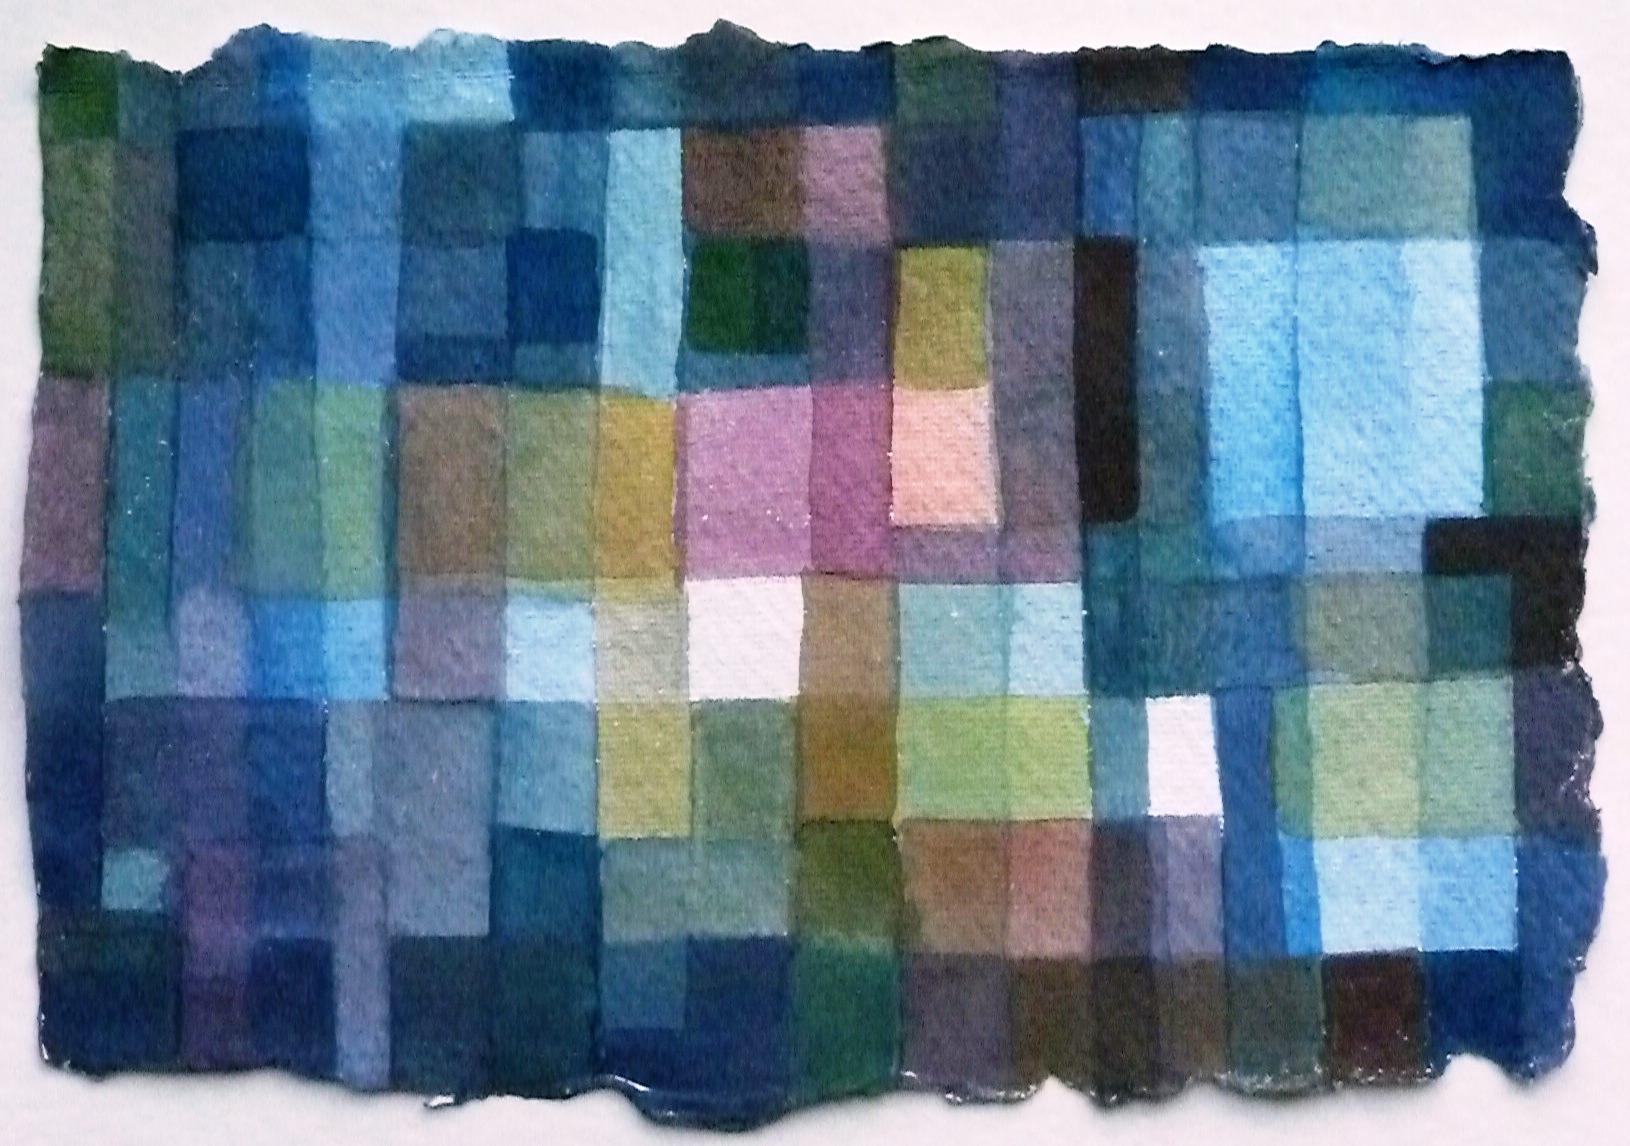 WINDOWS.  Watercolour on Handmade Paper. 2014.